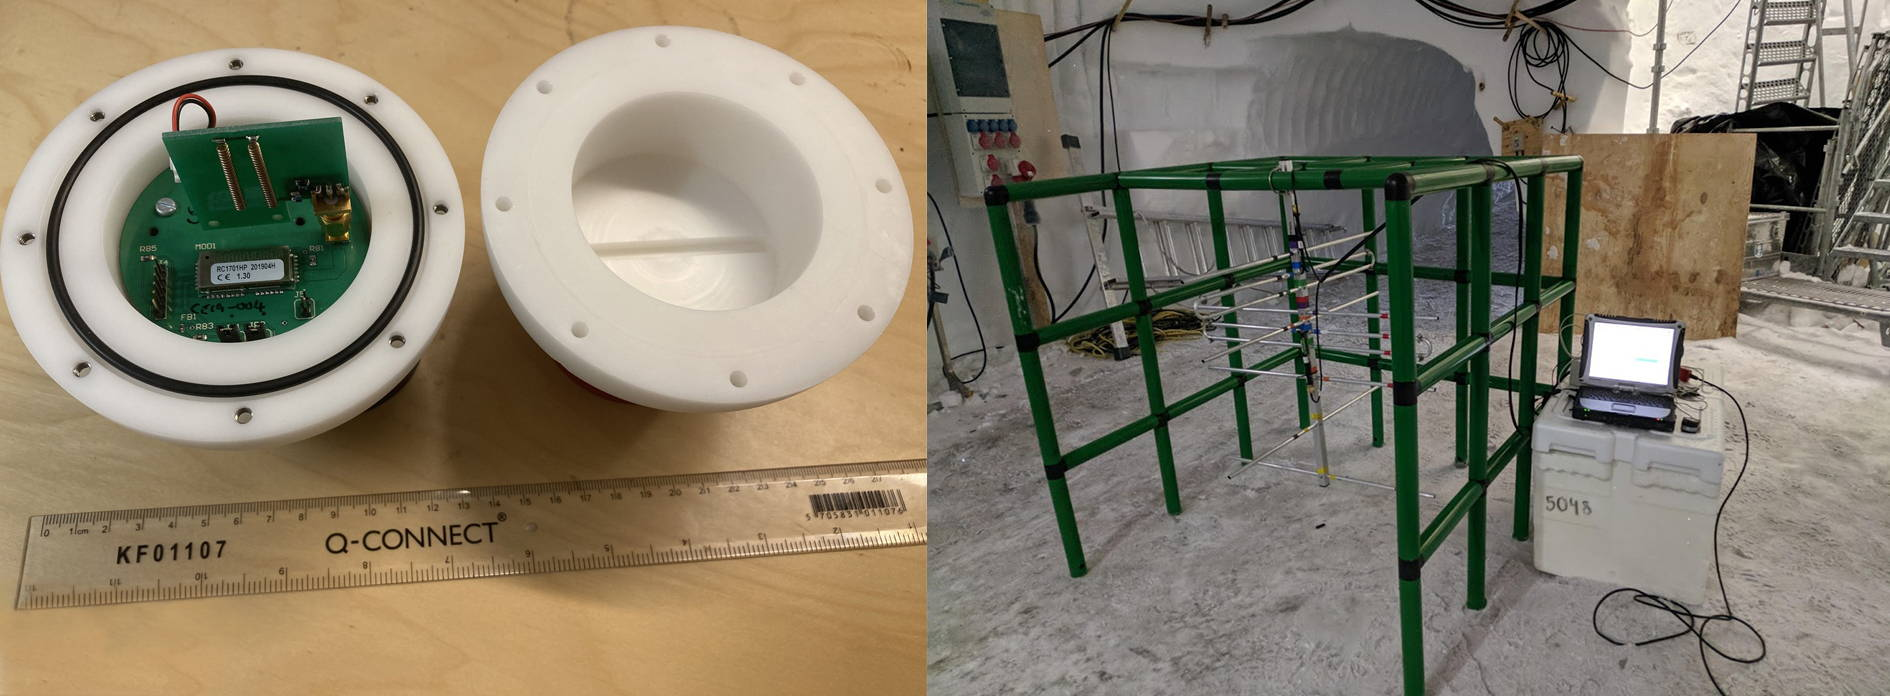 Слева: Cryoegg изнутри. Справа: каркас QUADRO с антенной